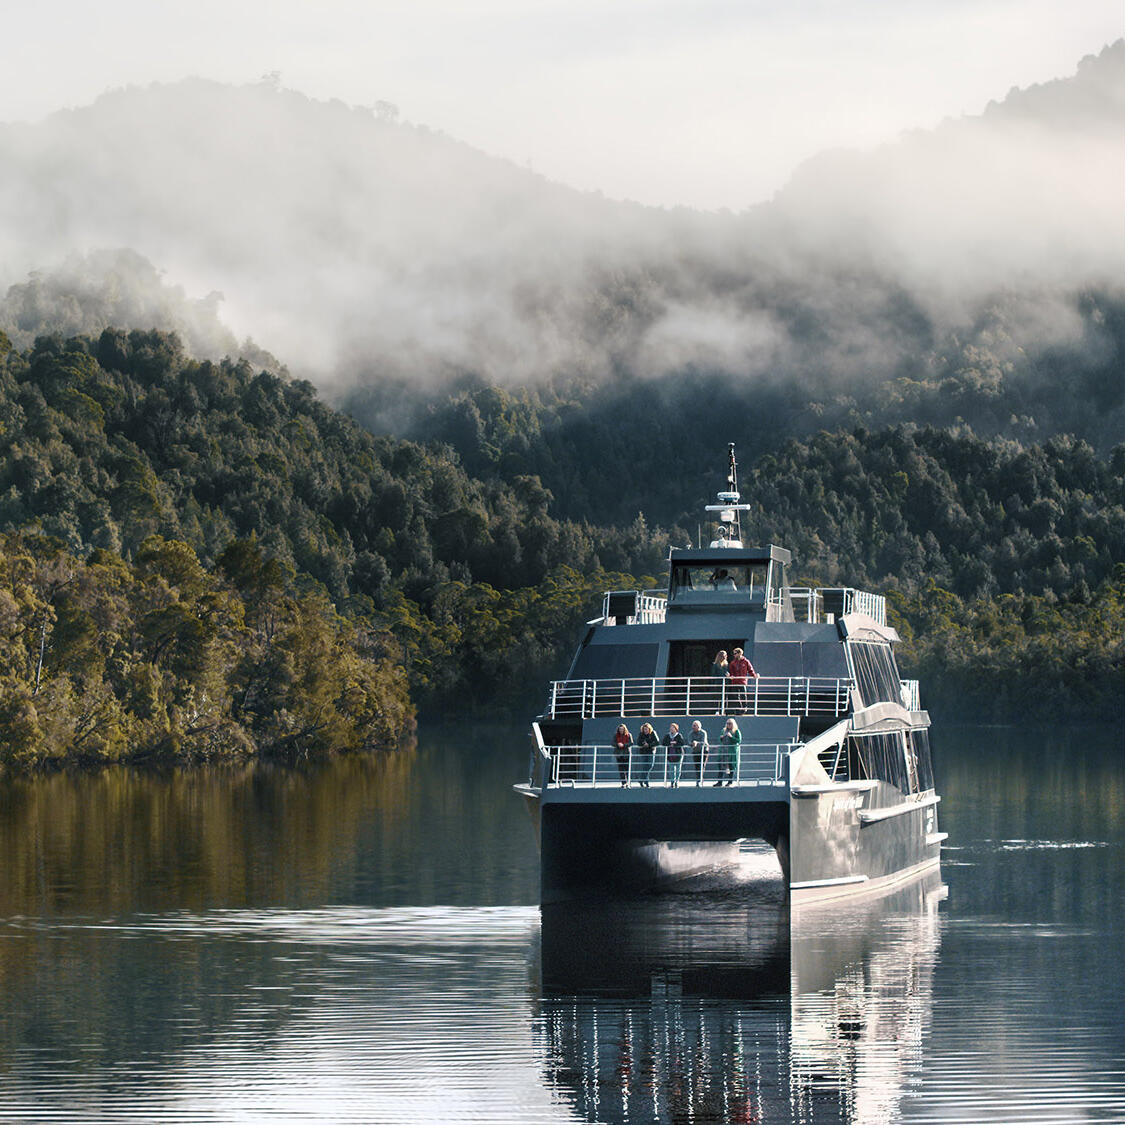 Front view of Cruise ship at Gordon River near the Gordon River Cruises